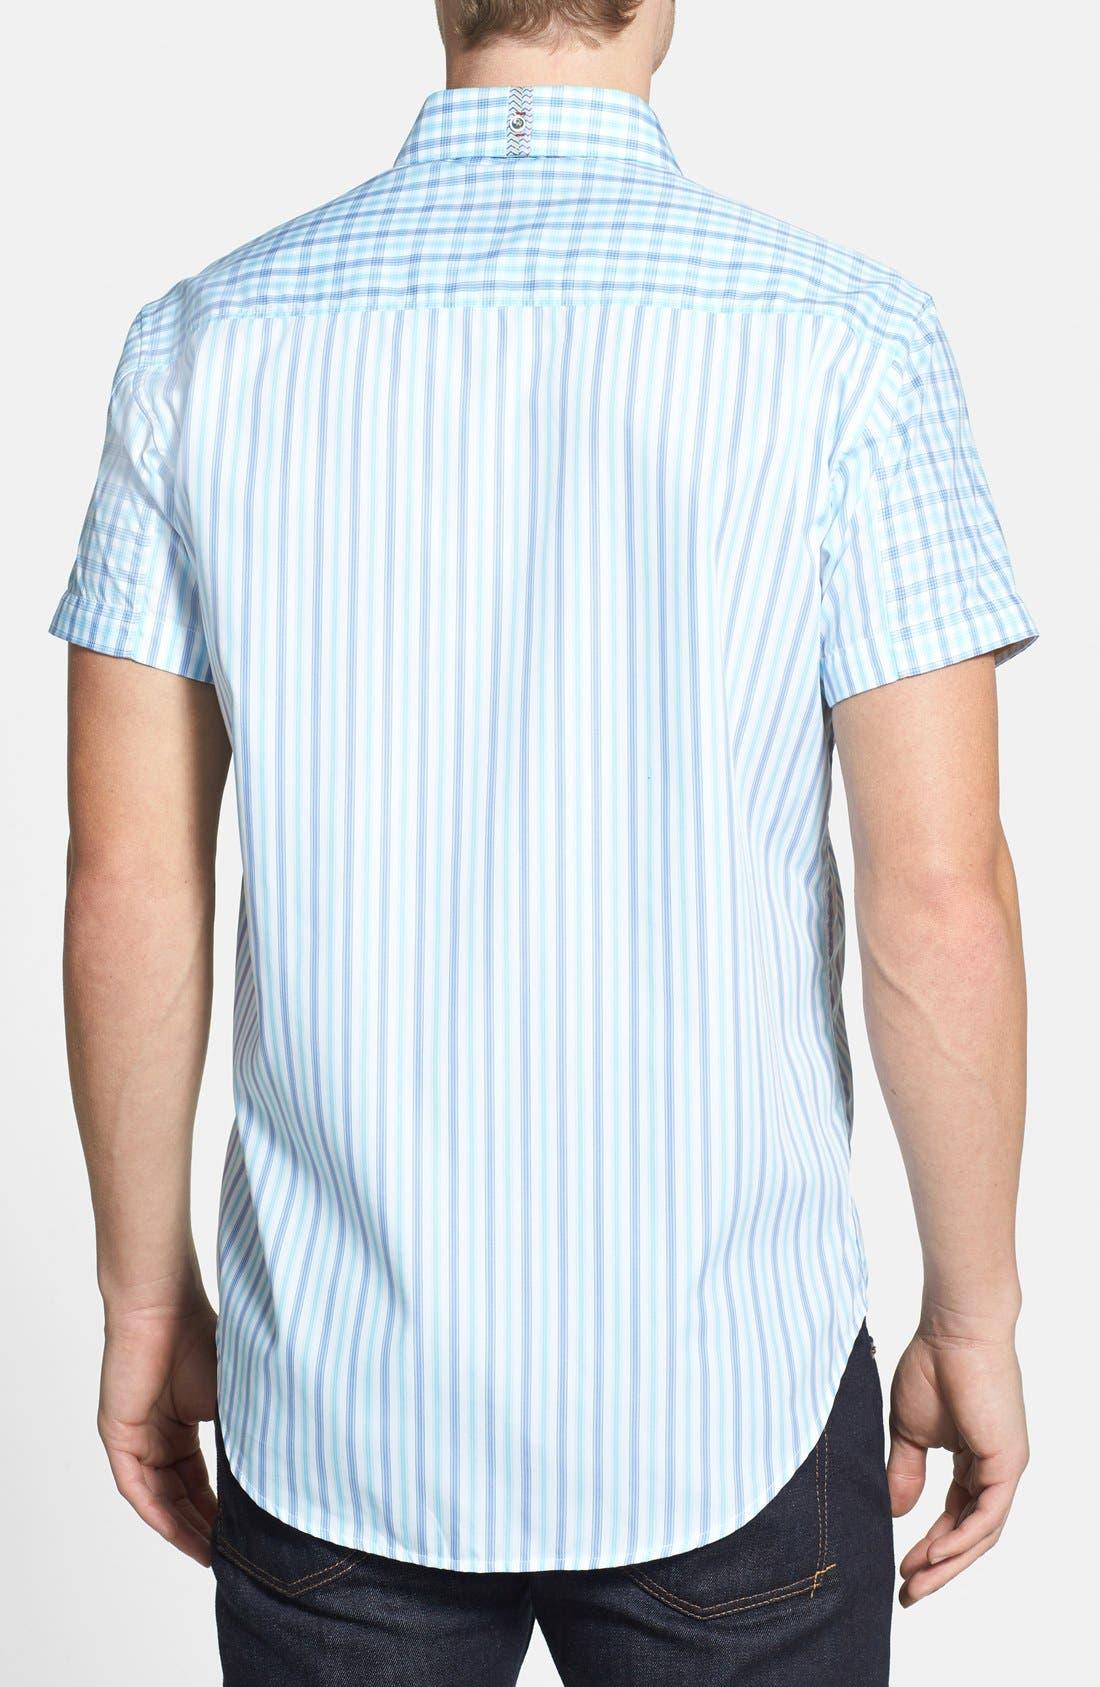 Alternate Image 2  - Robert Graham 'Fields' Tailored Fit Sport Shirt